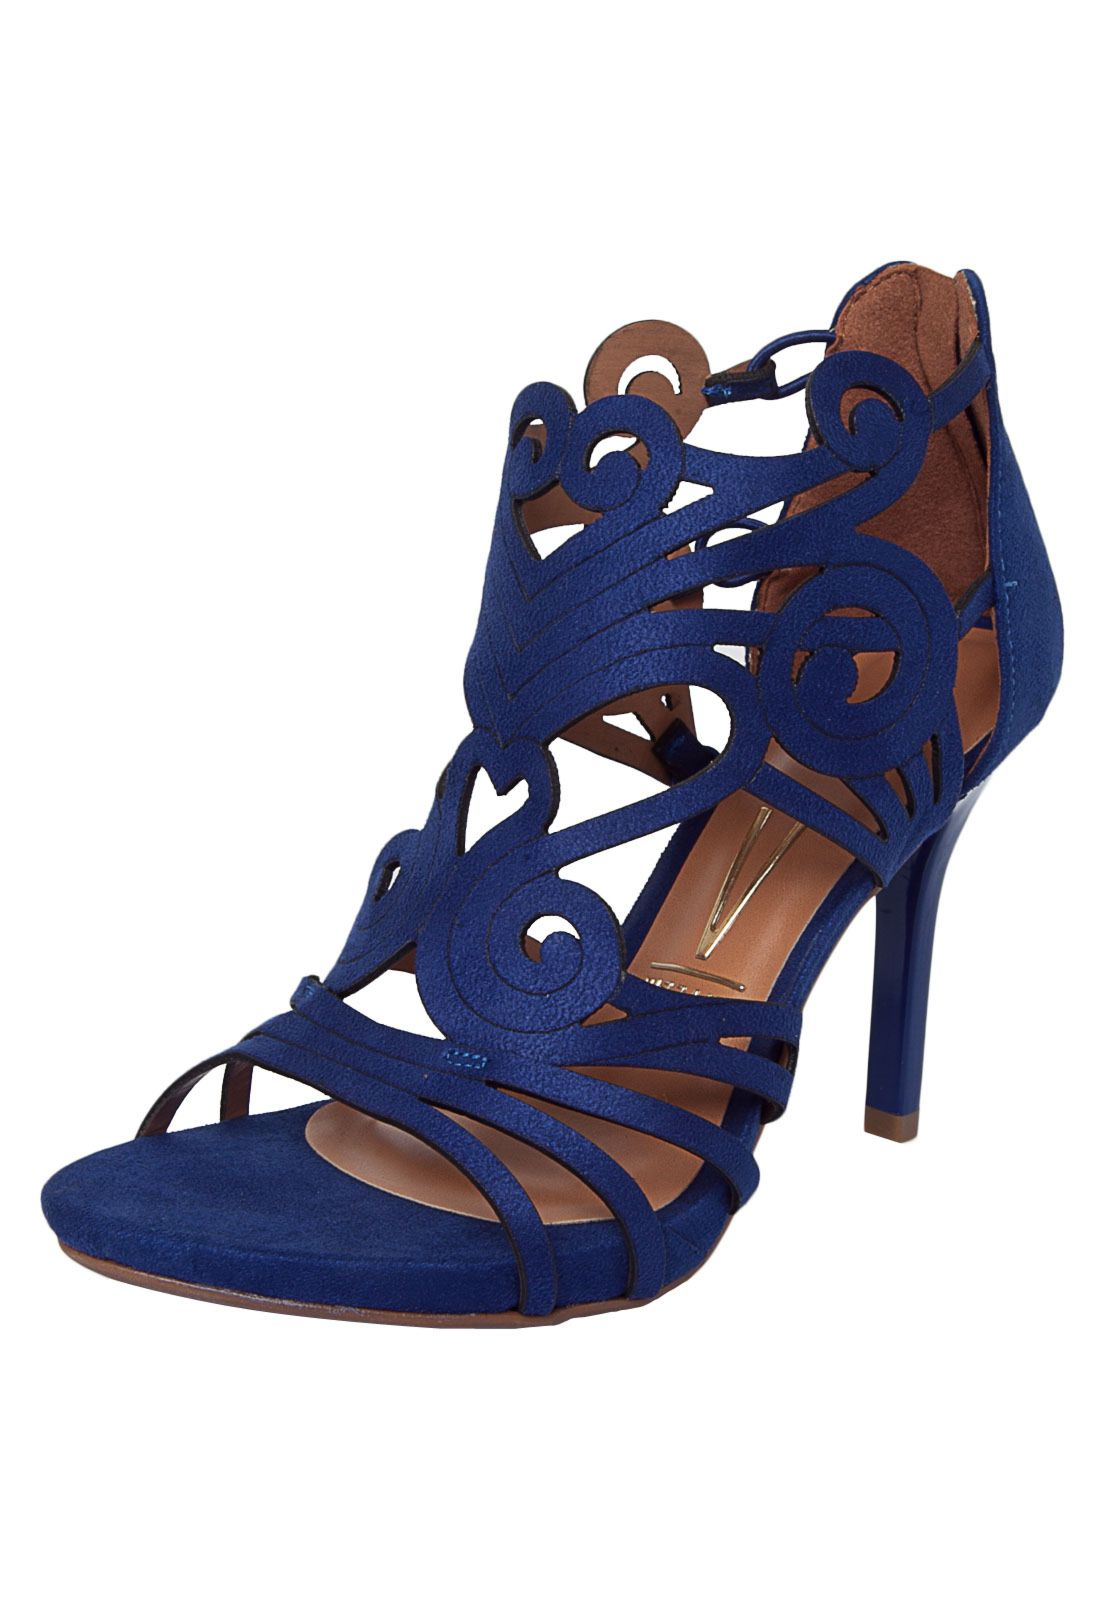 a47ef1d6a0 Sandália Vizzano Camurça Azul - Compre Agora